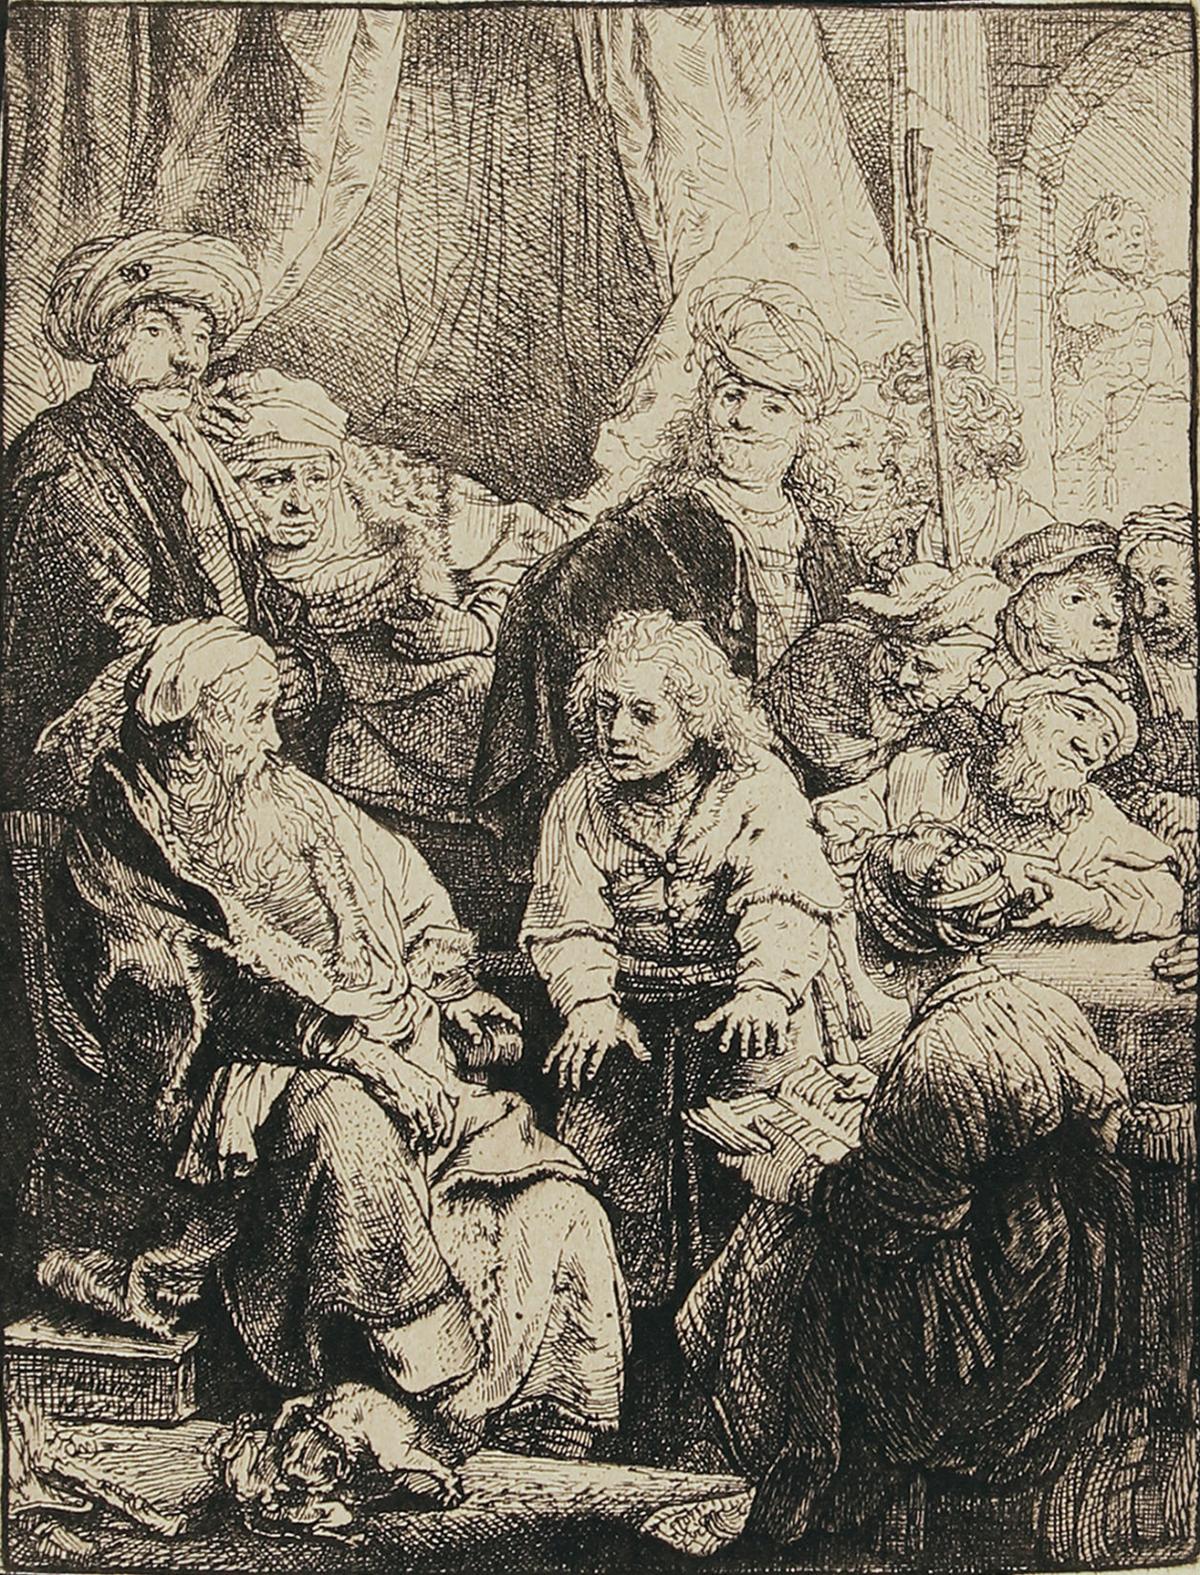 022020 Rembrandt 2